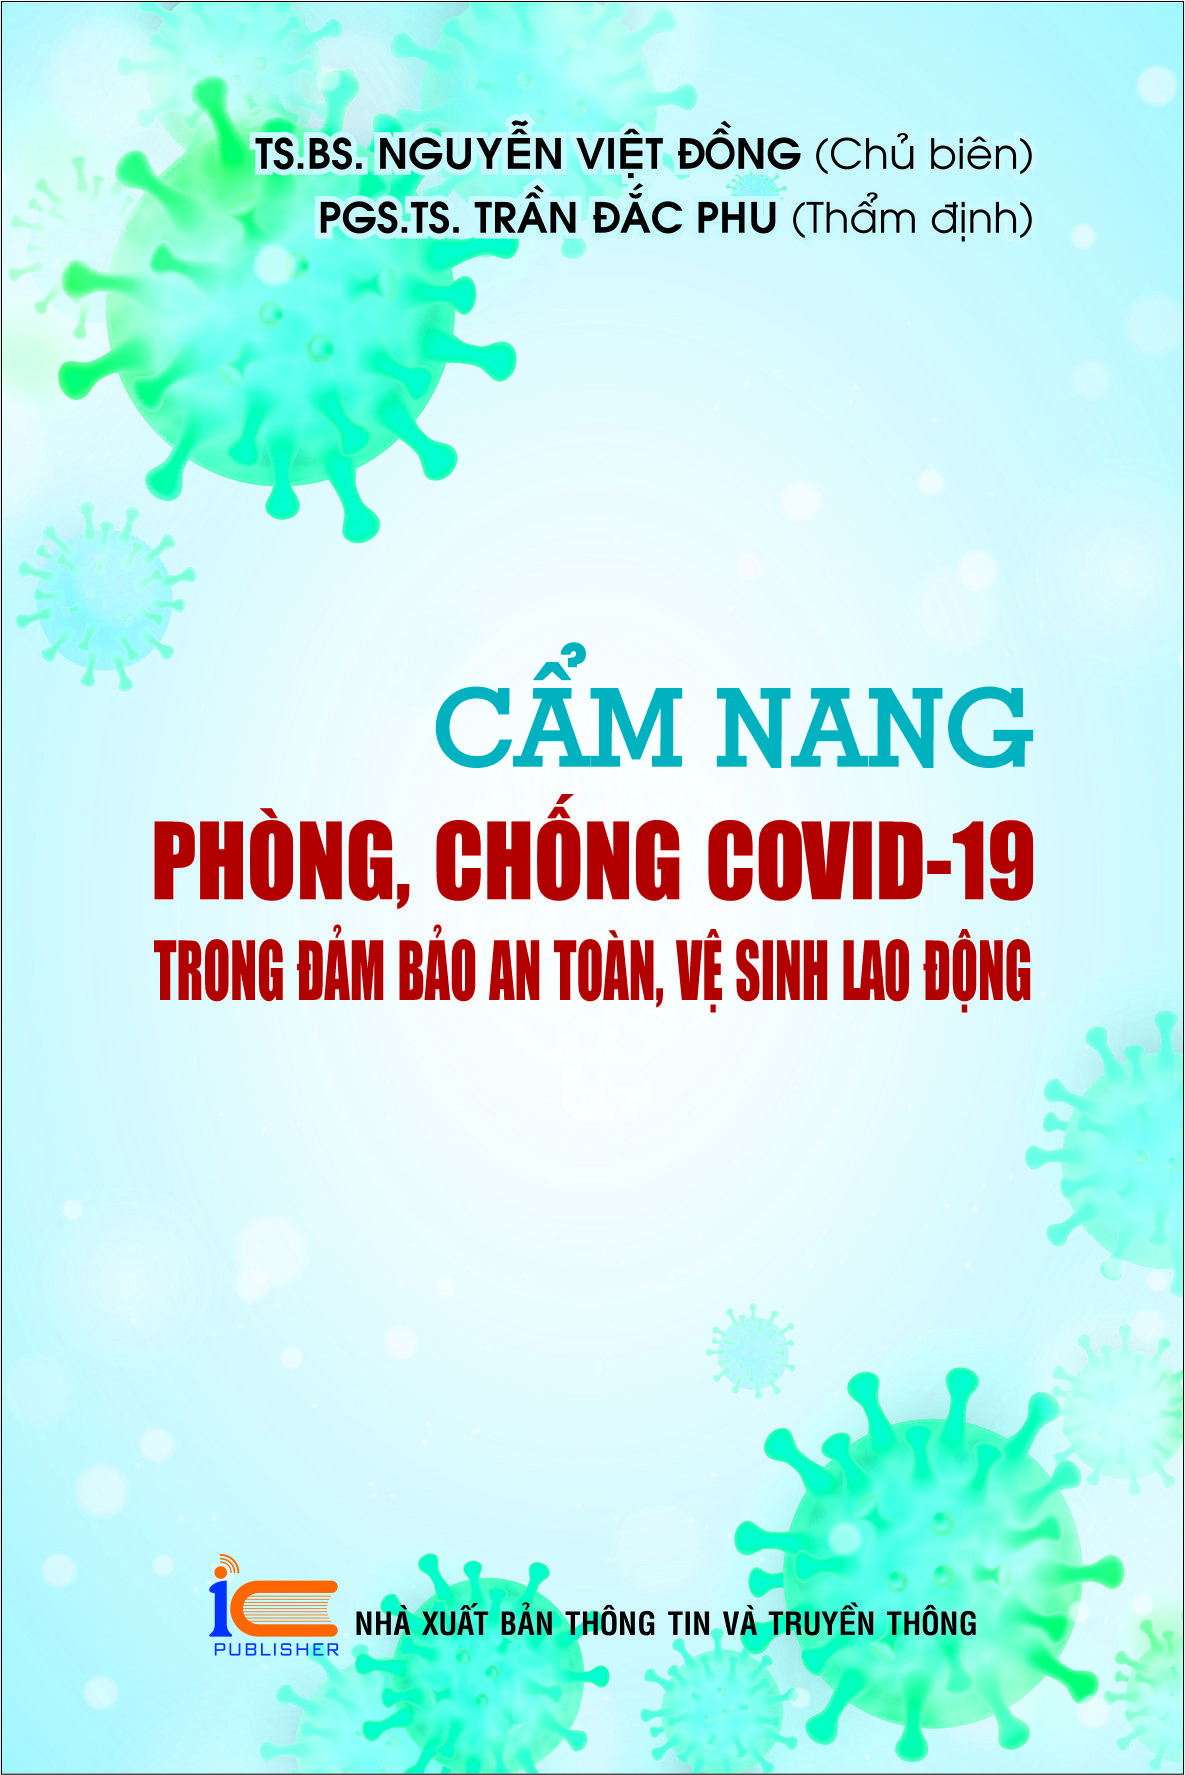 Cam-nang-PC-Covid-19.jpg